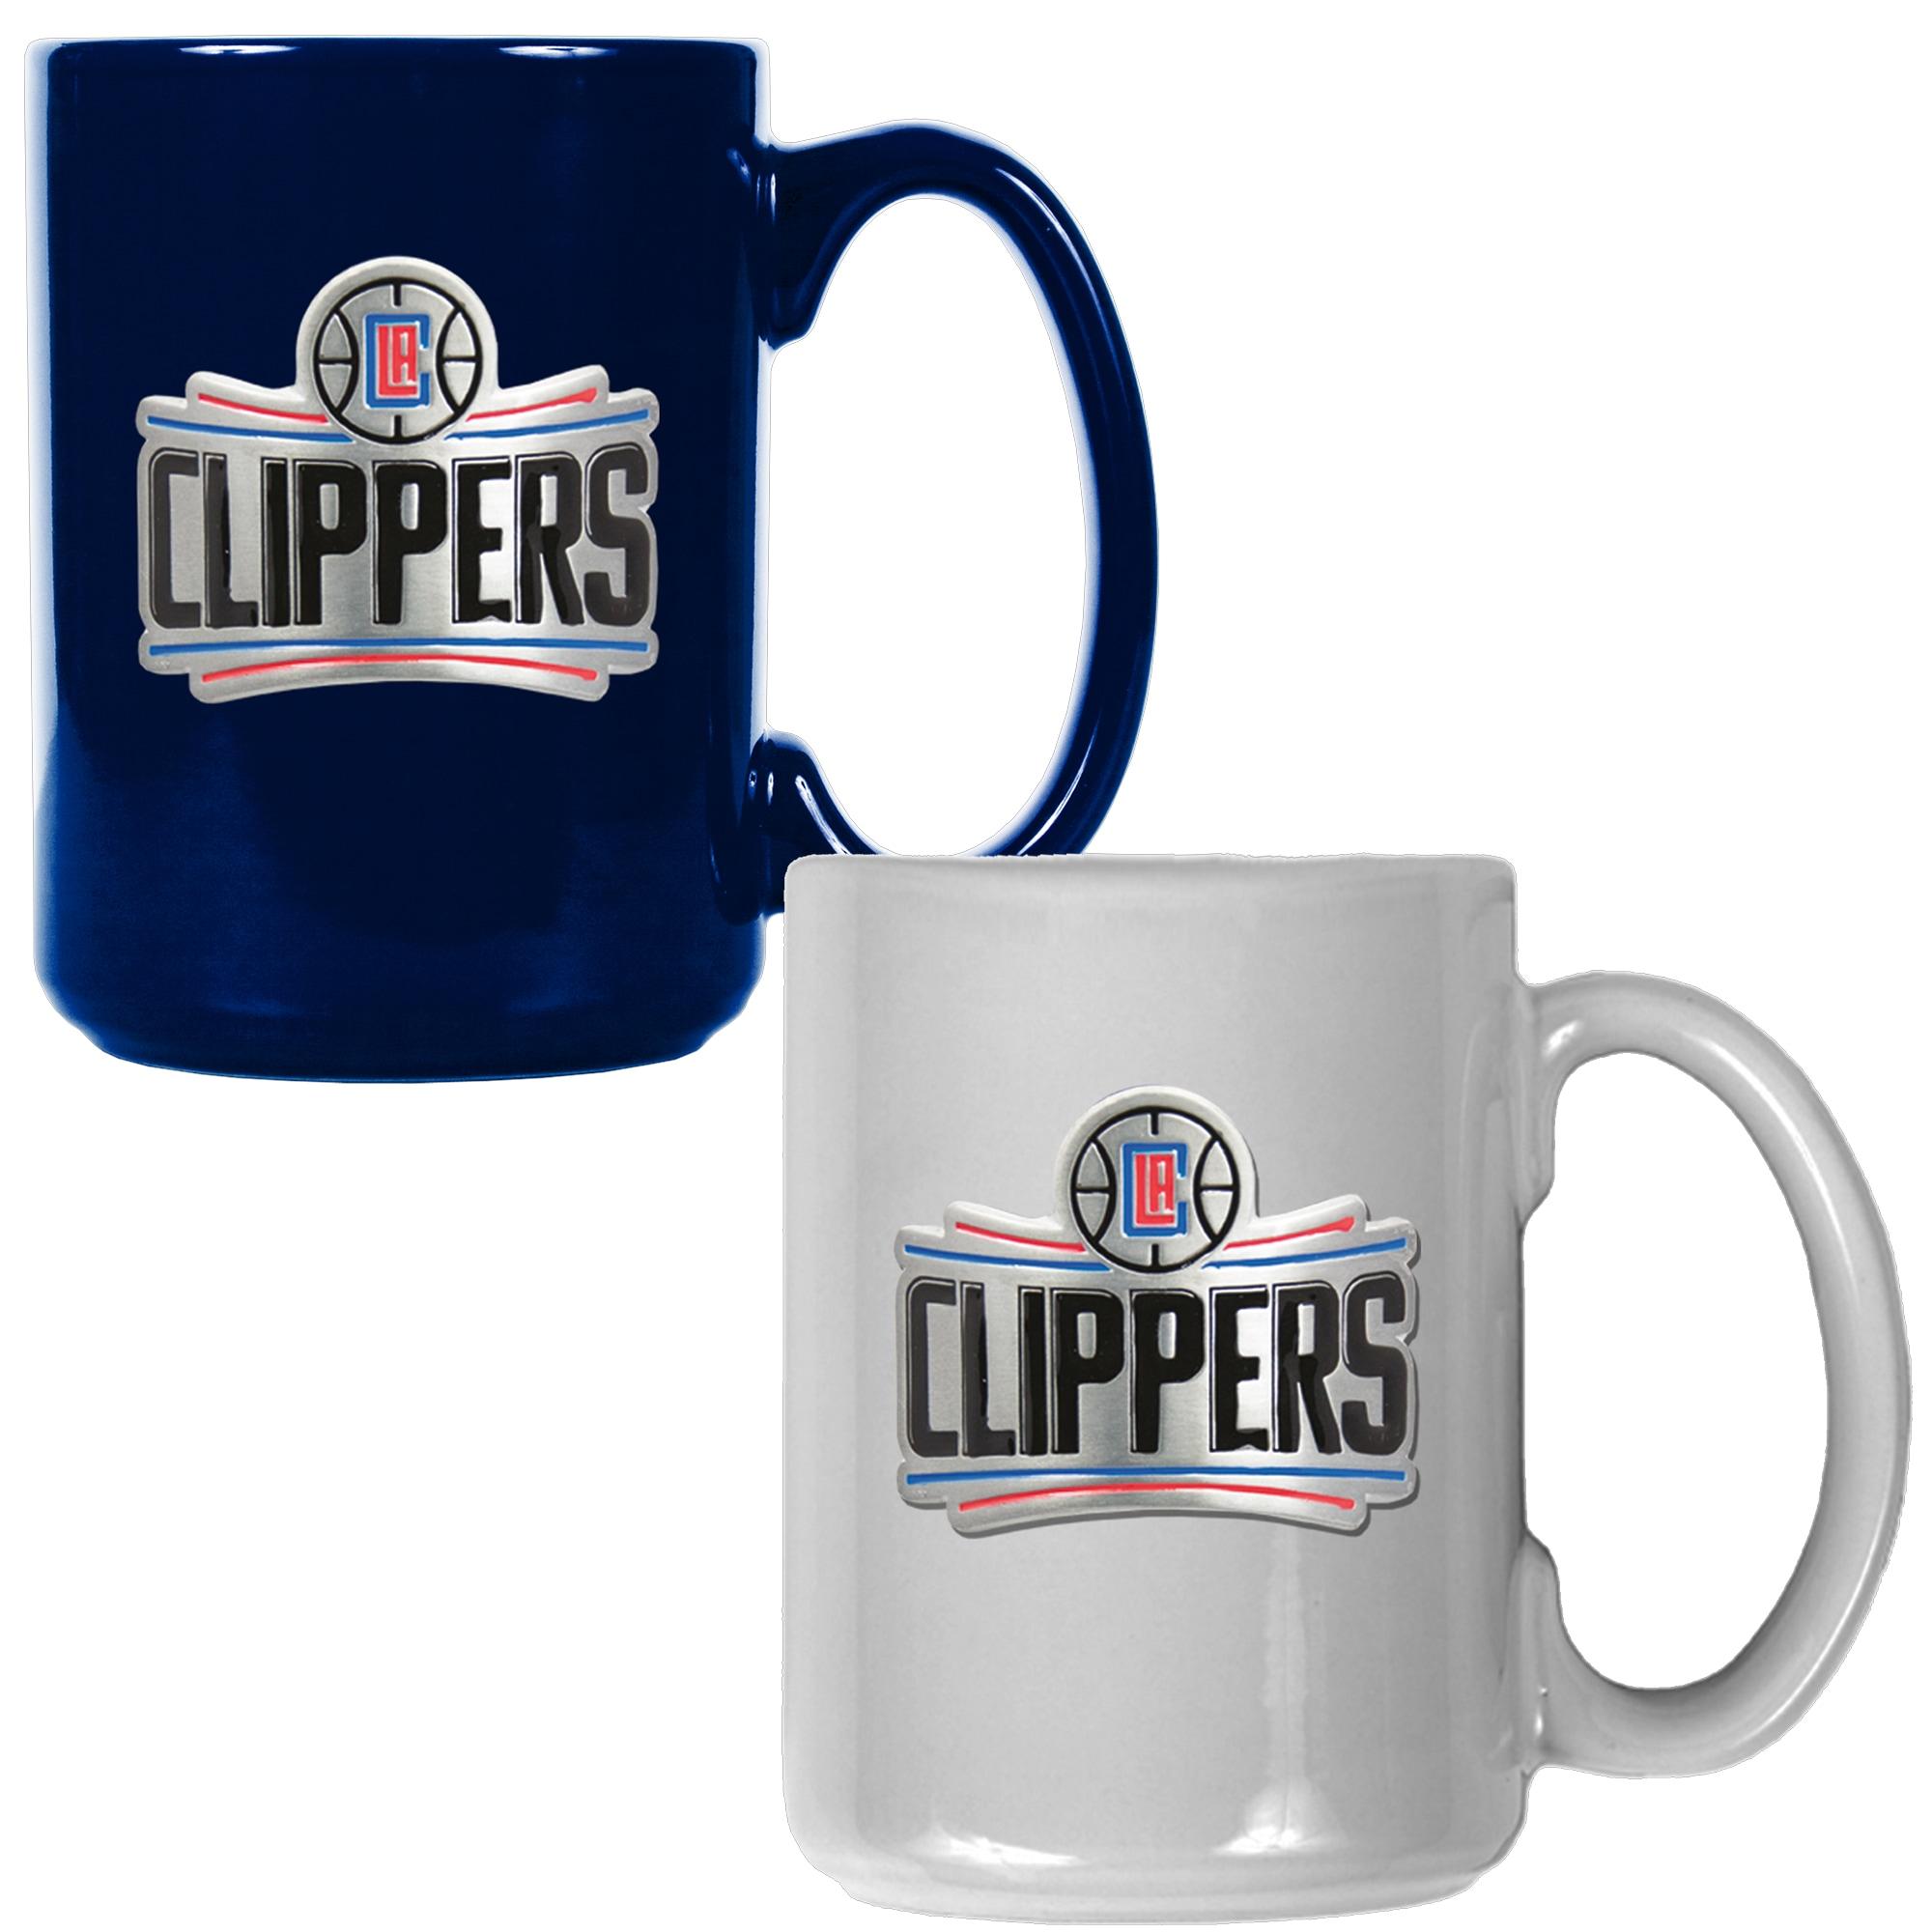 LA Clippers 15oz. Coffee Mug Set - Royal/White